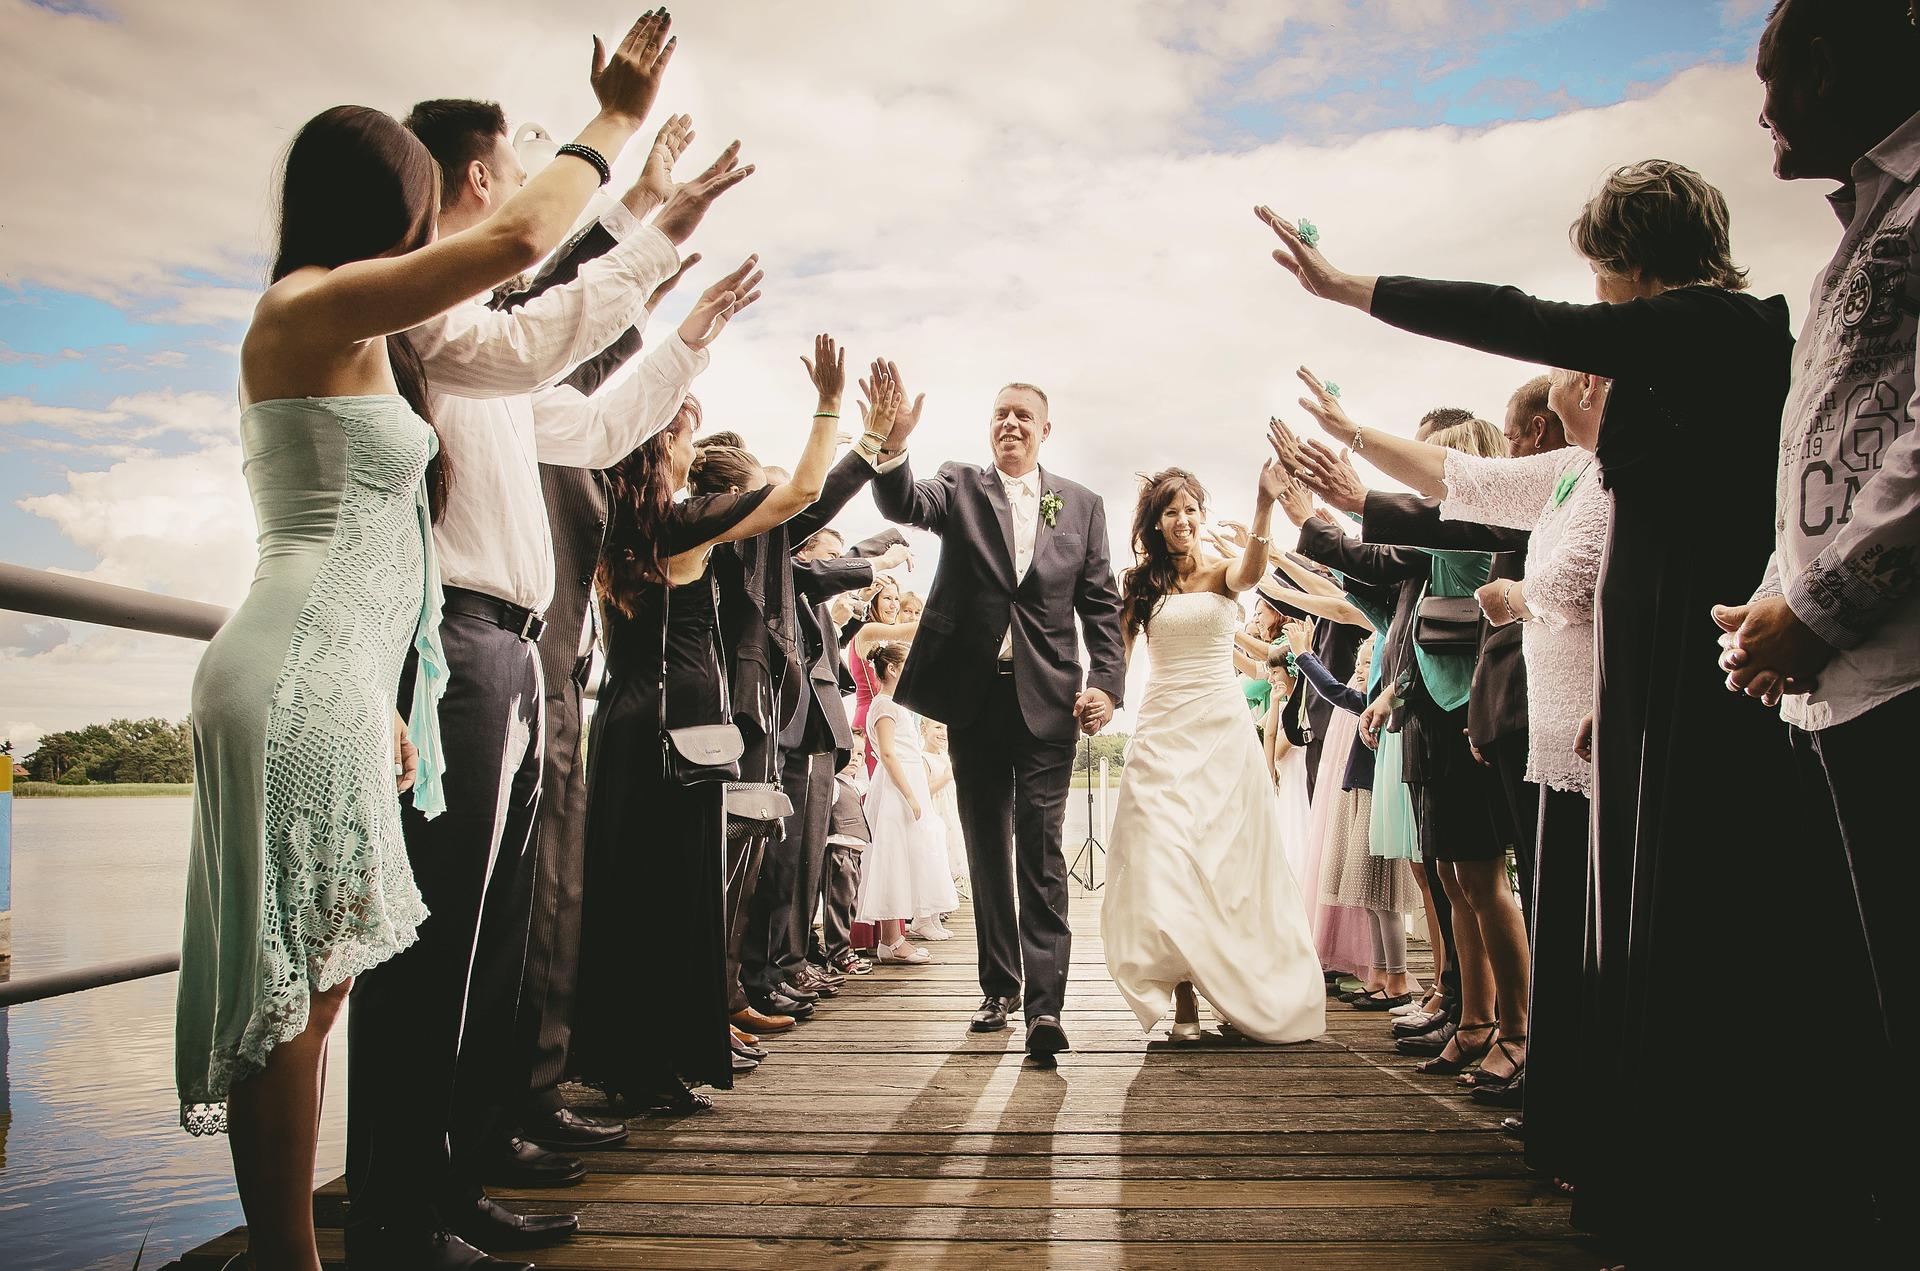 Hochzeitsvideo Hamburg Alper Tunc Films